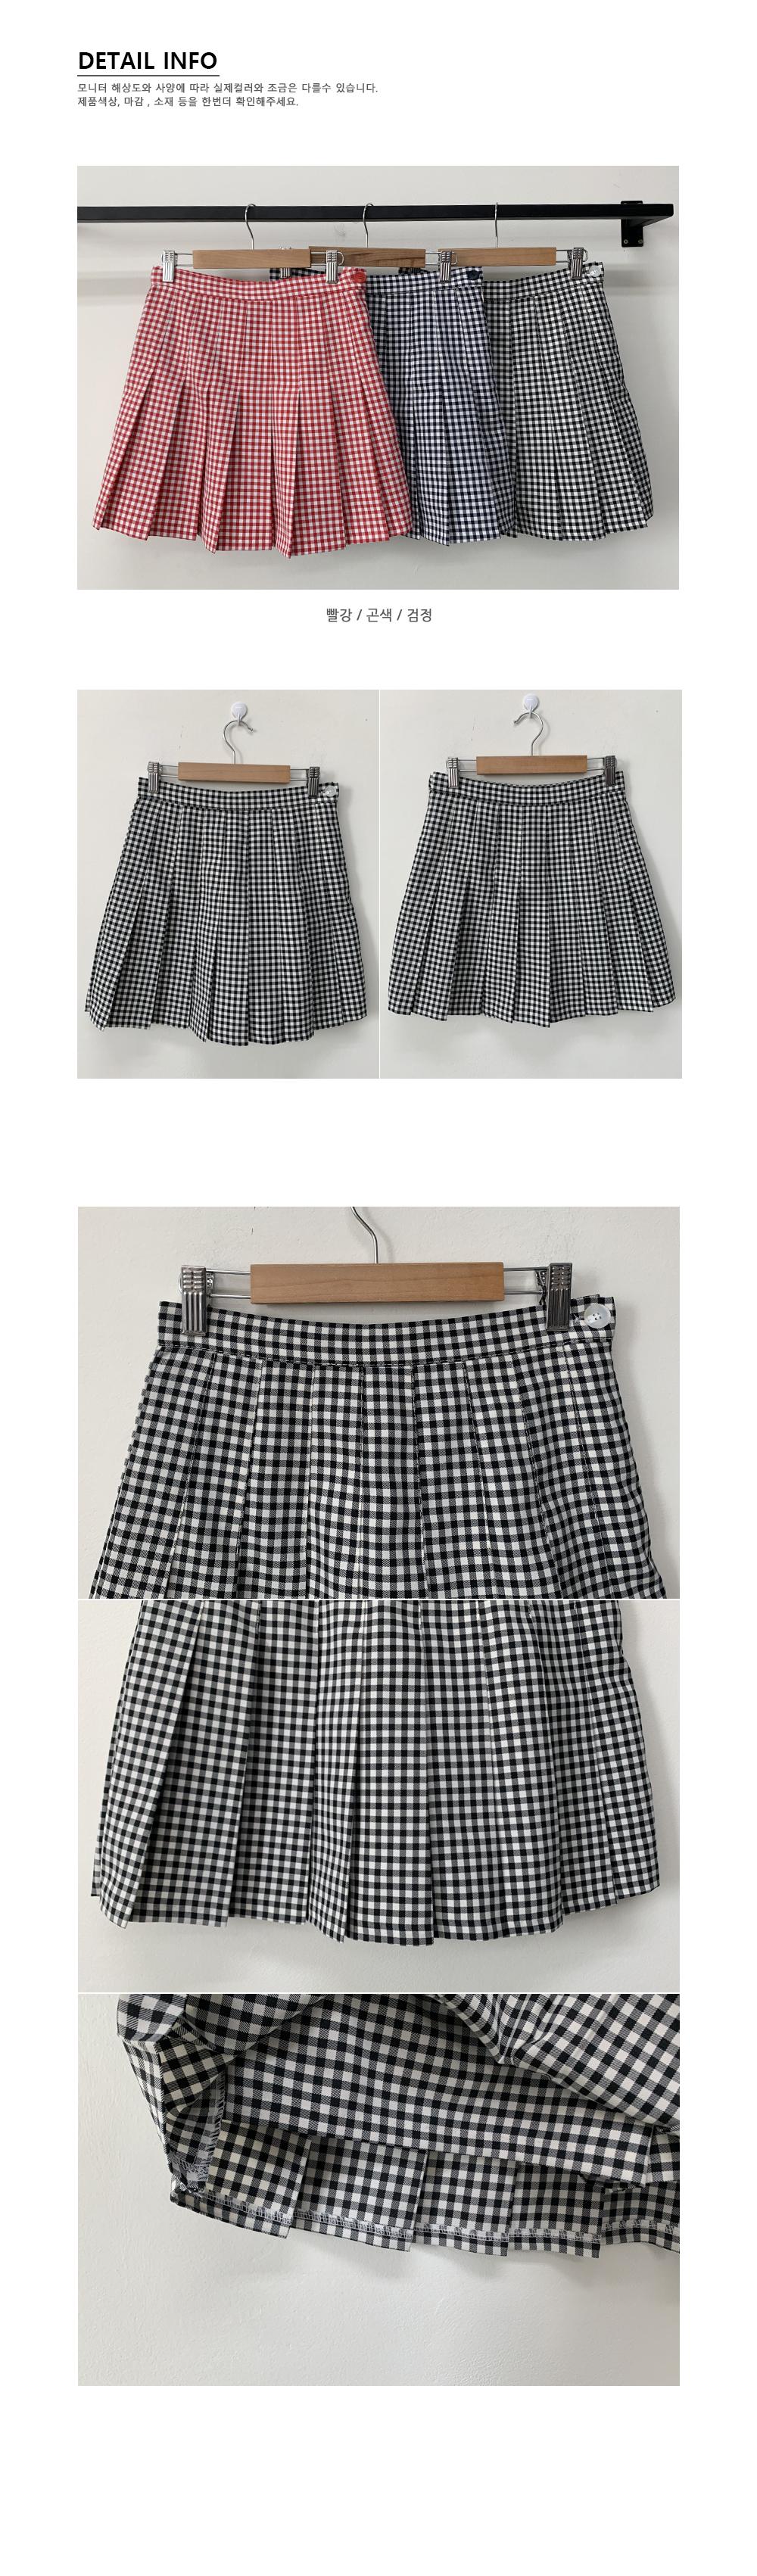 Monet check tennis skirt